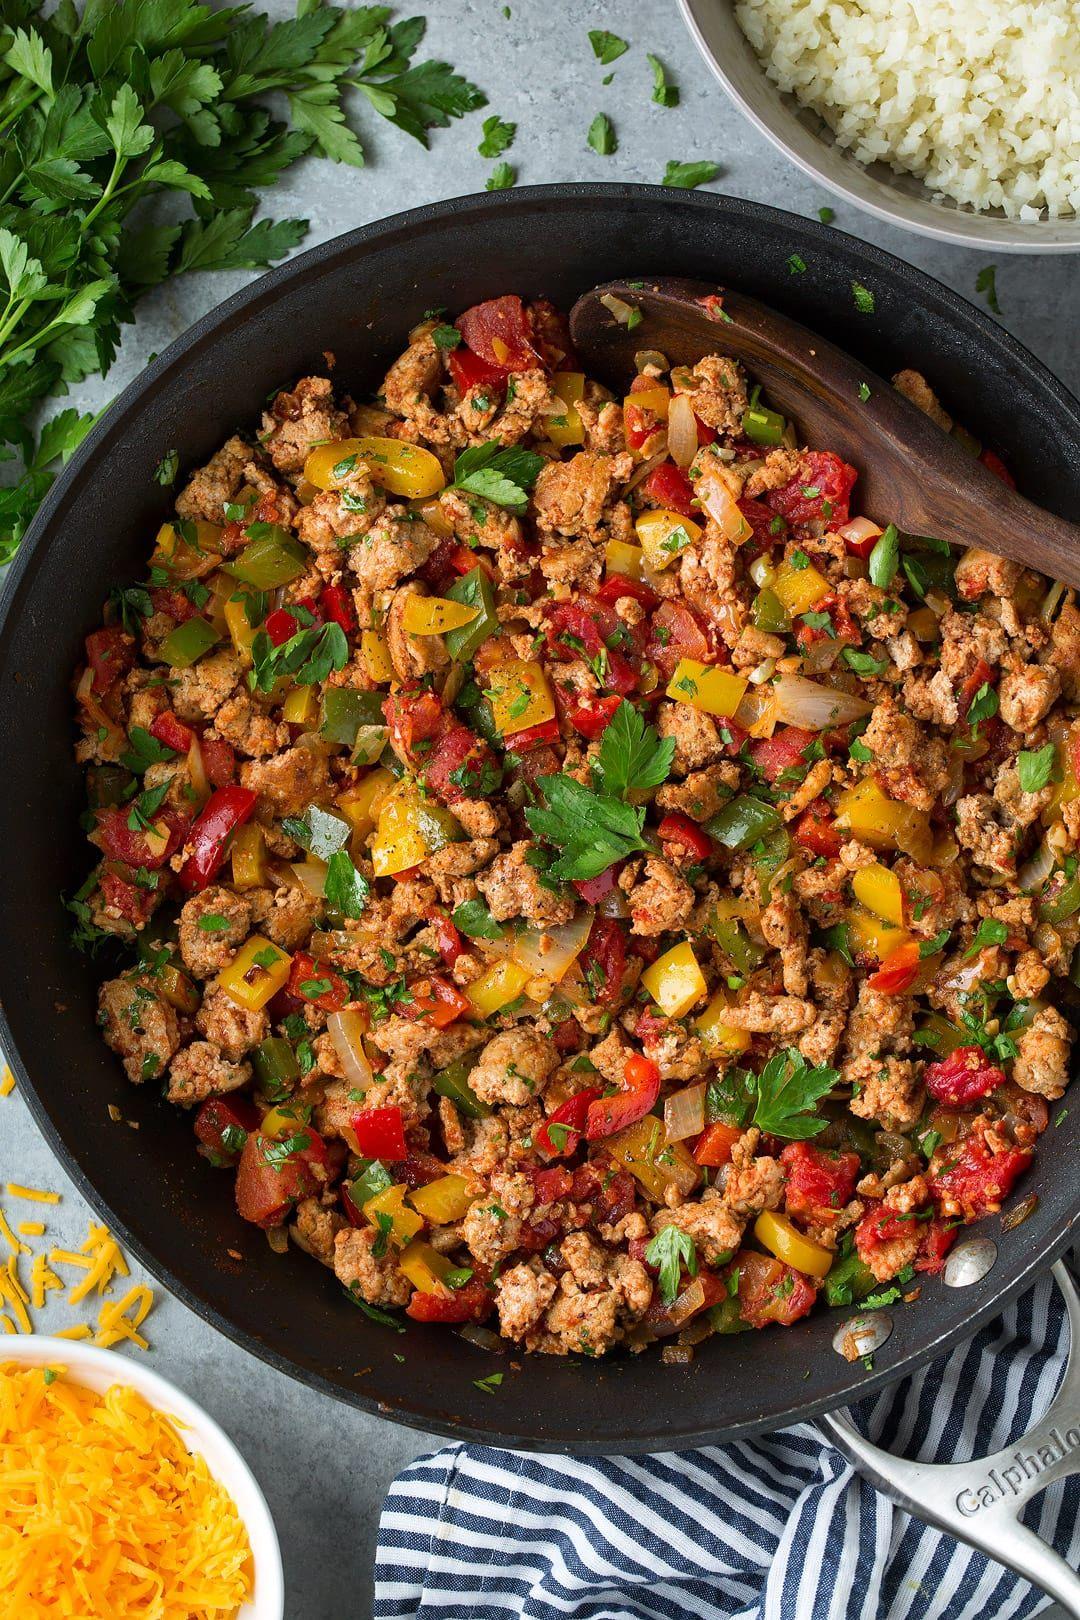 Casserole Crockpot Recipes Healthy